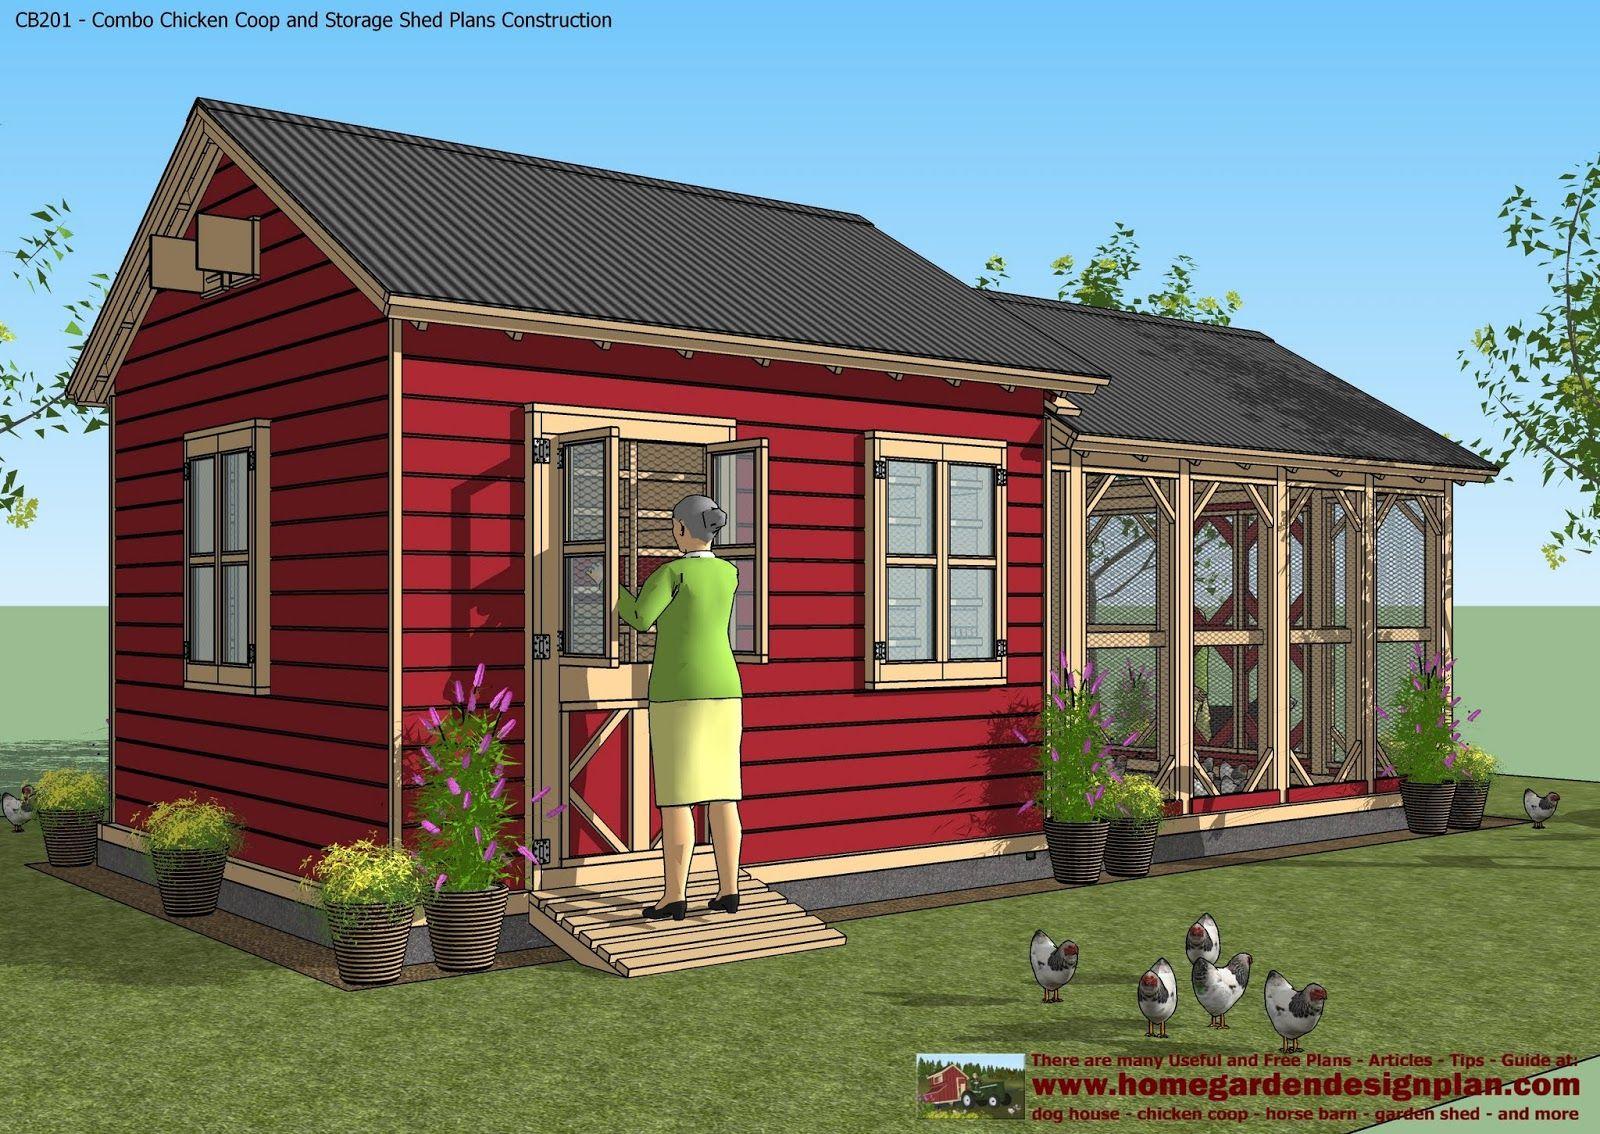 Cb201 Combo Plans En Coop Construction Garden Sheds Storage